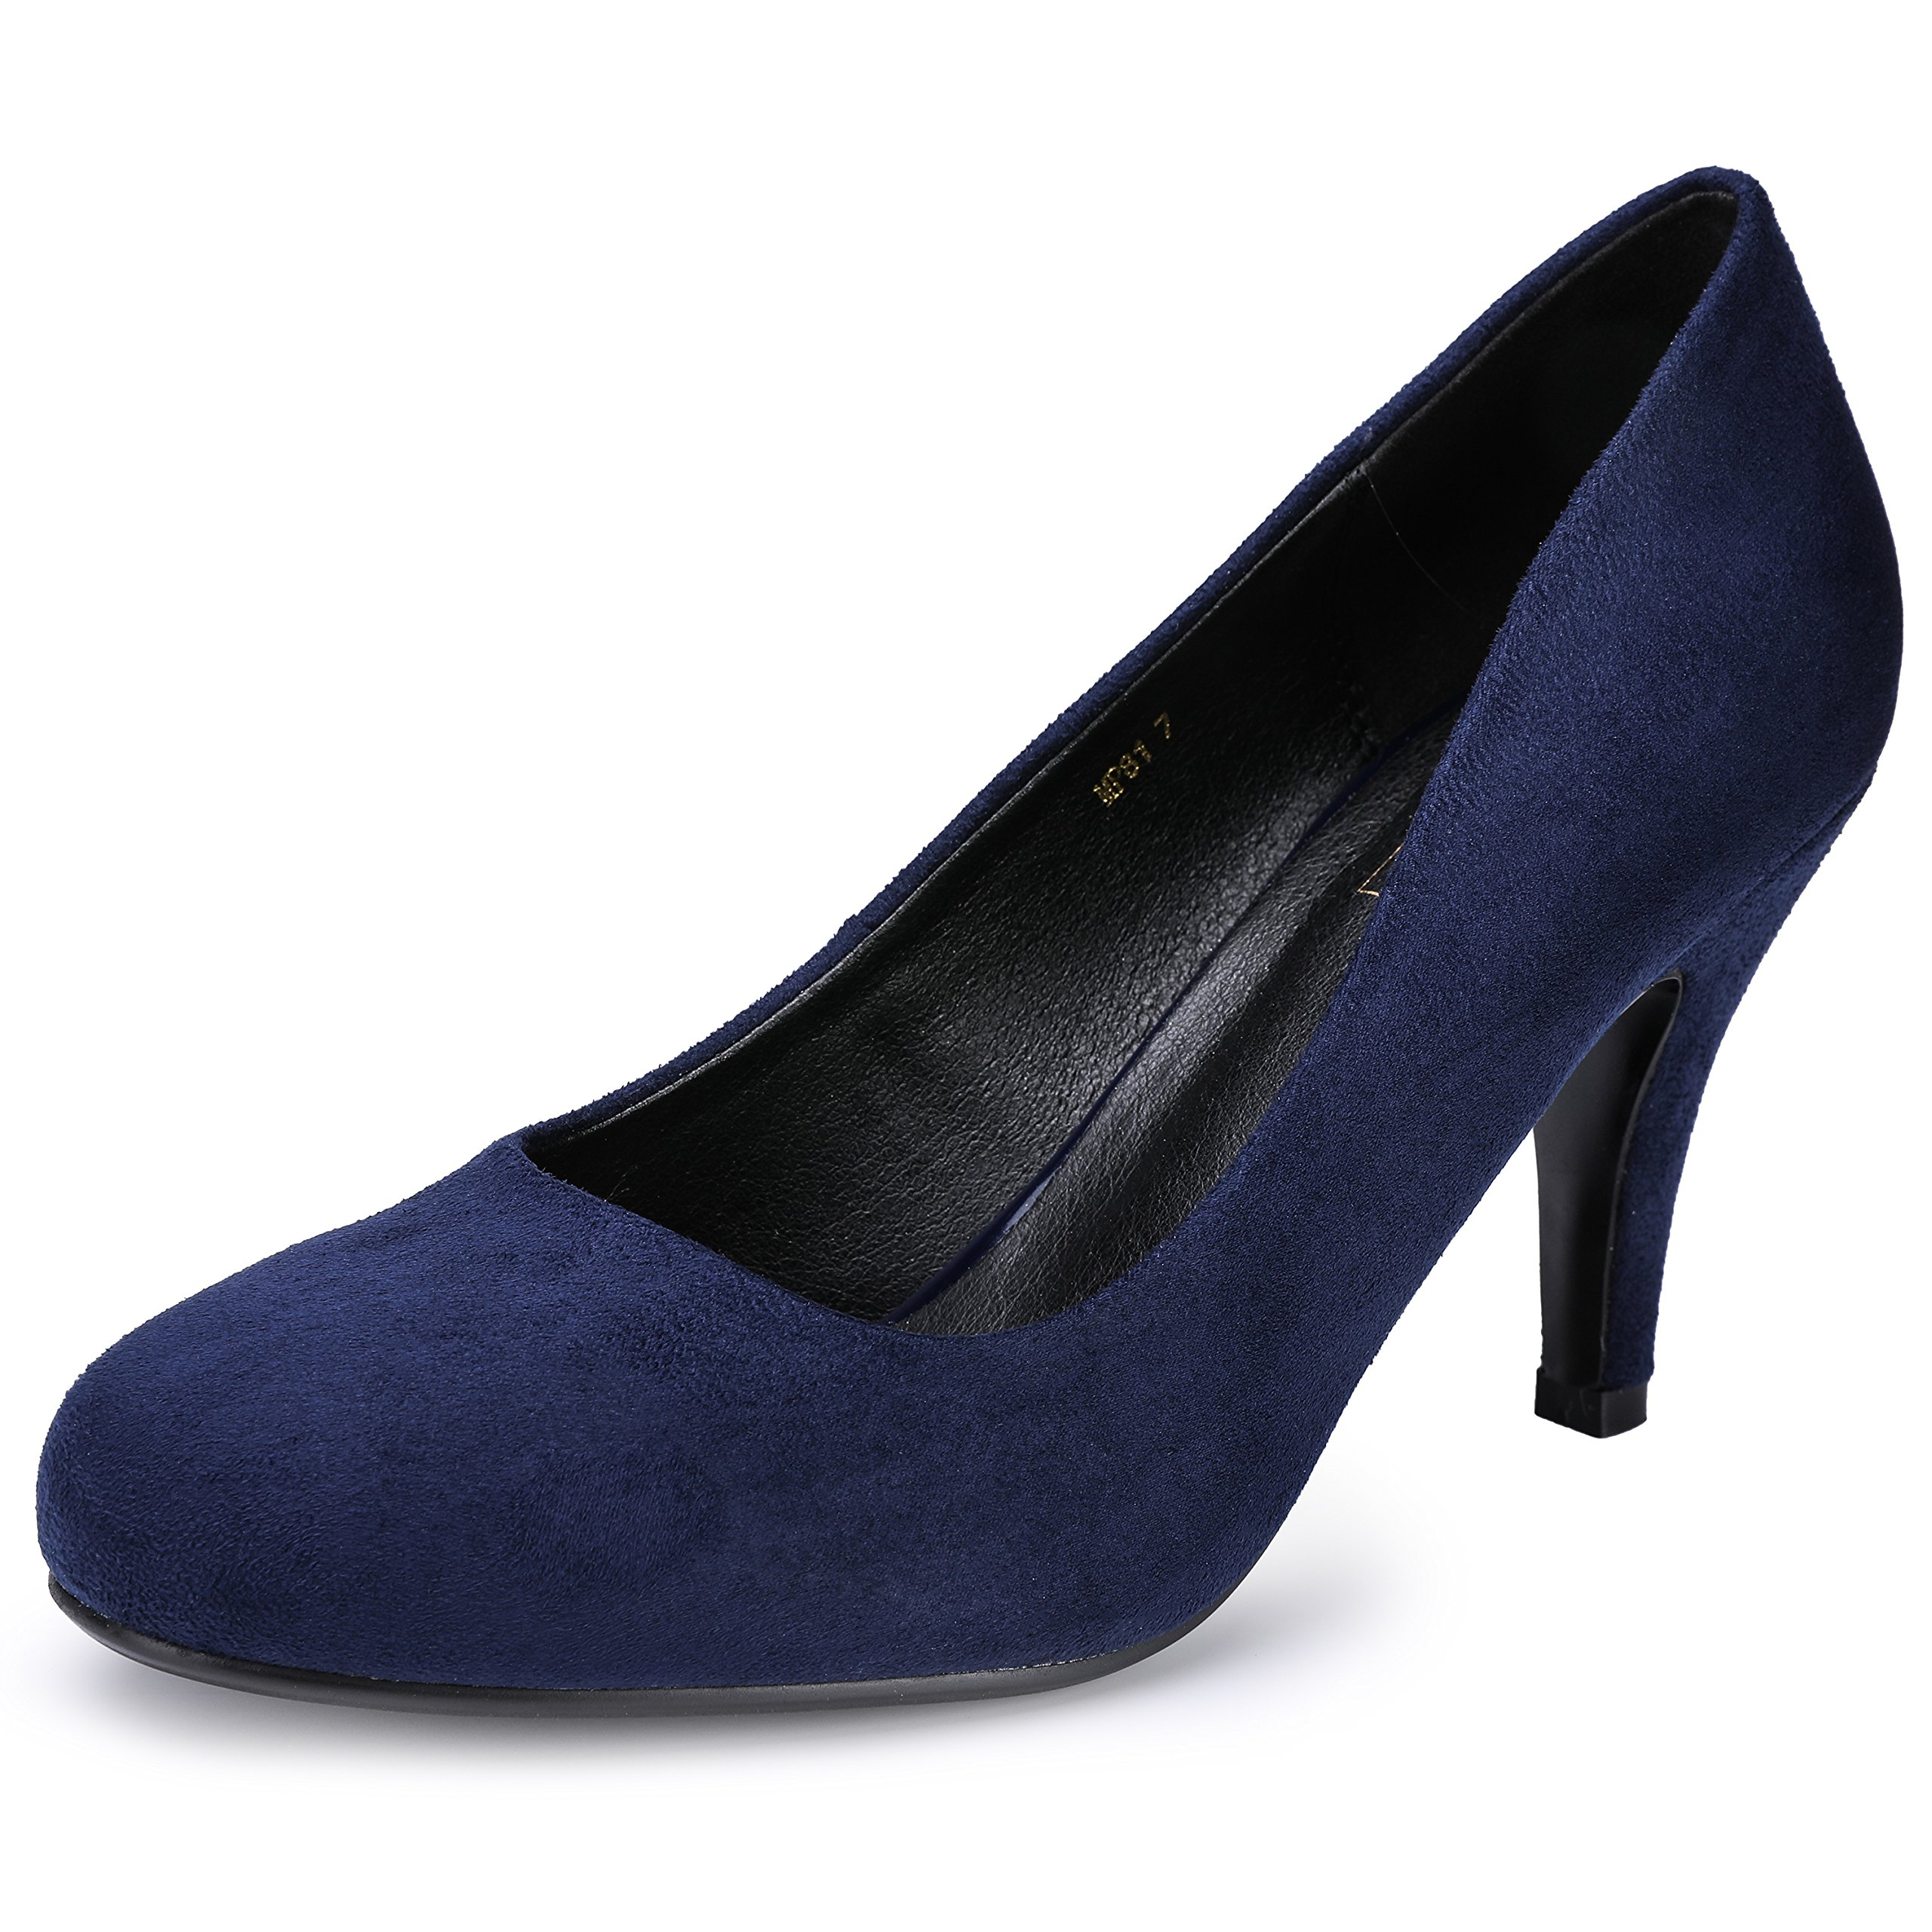 IDIFU Women's RO4 Elegant Round Toe High Heel Pump Shoes (Blue Suede, 11 B(M) US)